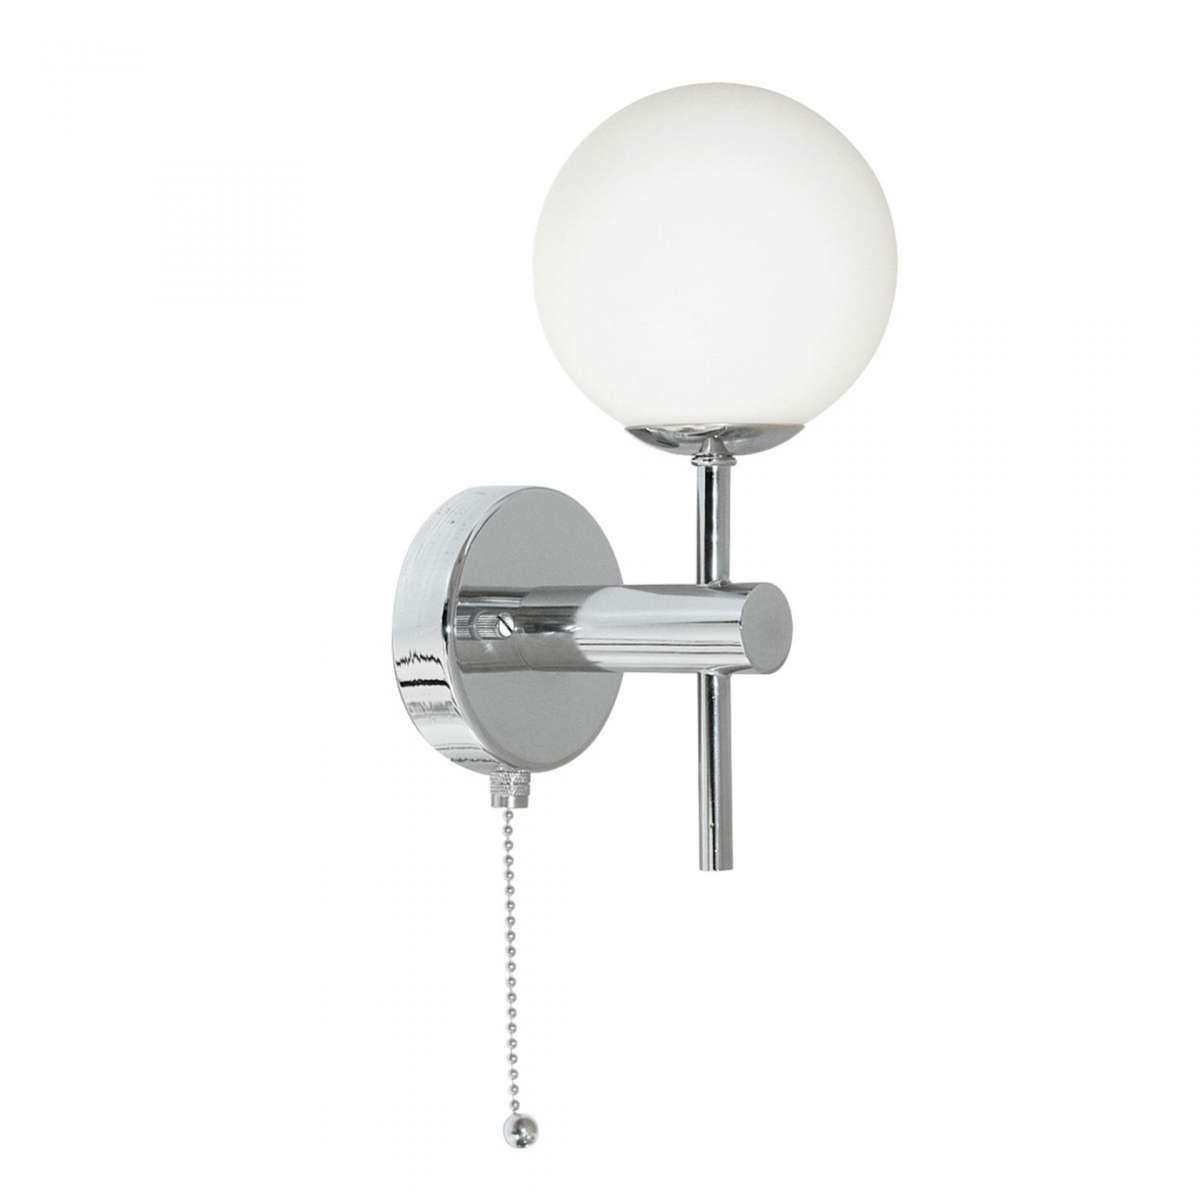 Bathroom IP44 Global Chrome Wall Bracket With Opal Glass